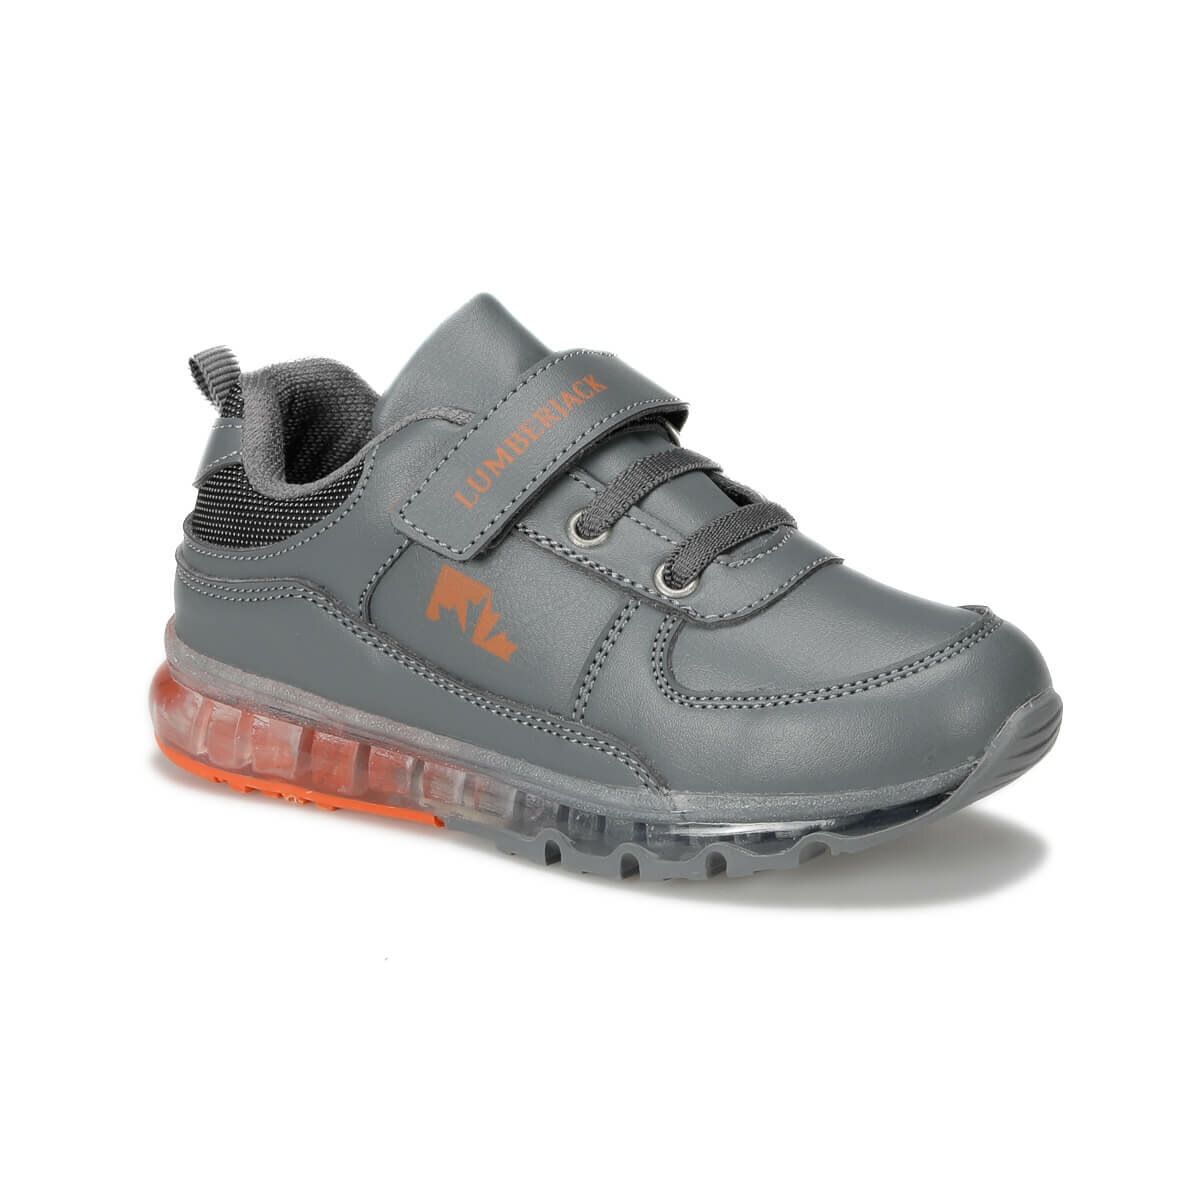 FLO CAP 9PR Dark Gray Male Child Sneaker Shoes LUMBERJACK